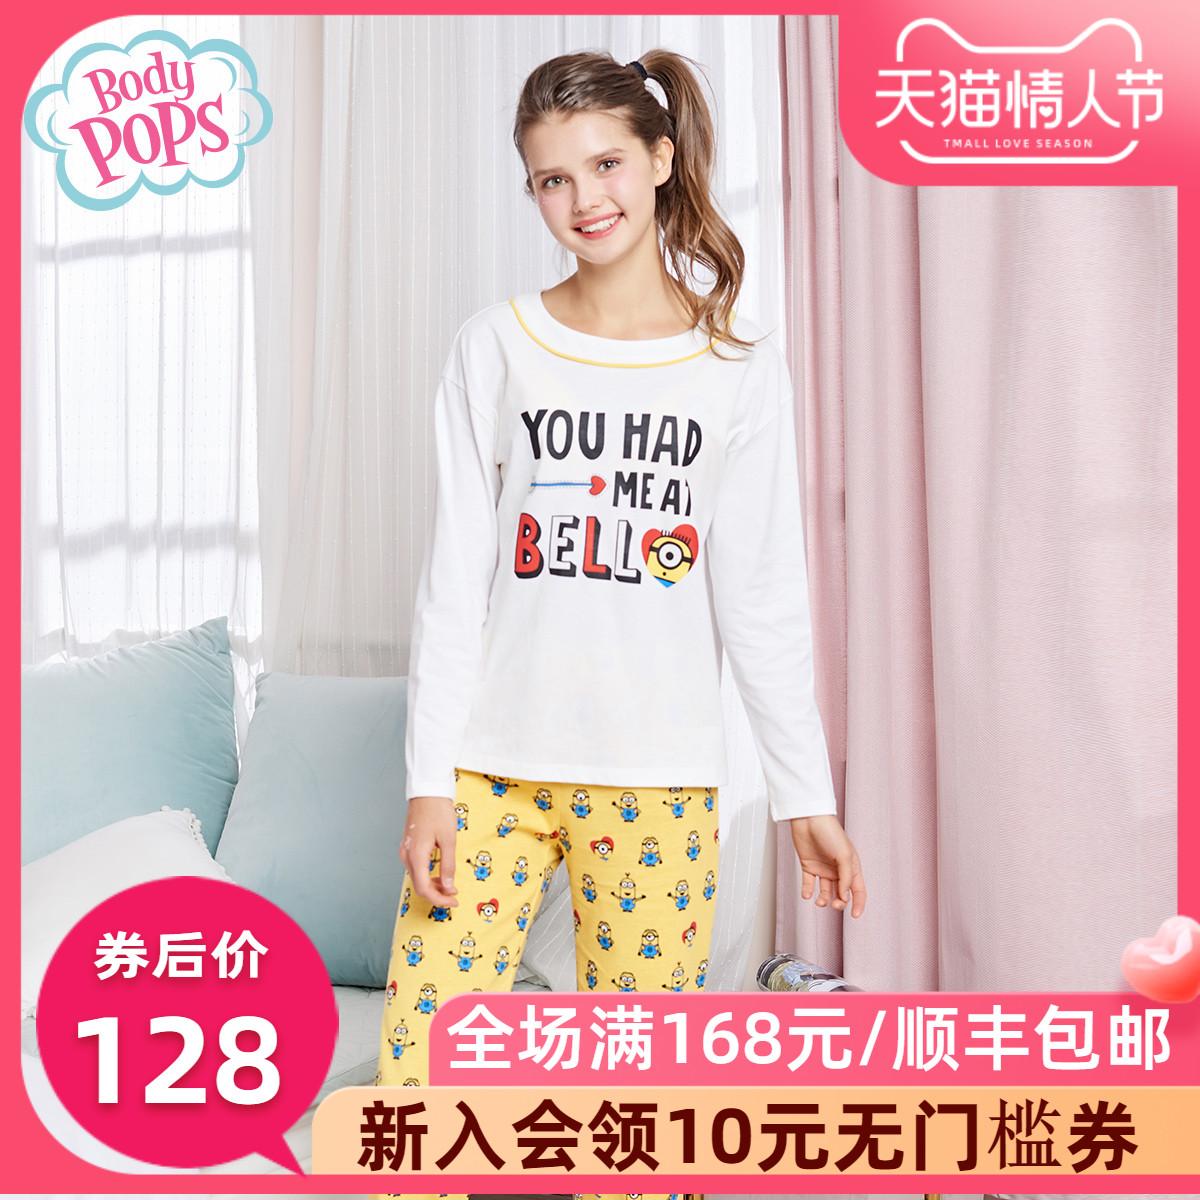 bodypops2019年新款小黄人圆领家居服舒适透气棉质睡衣两件套装